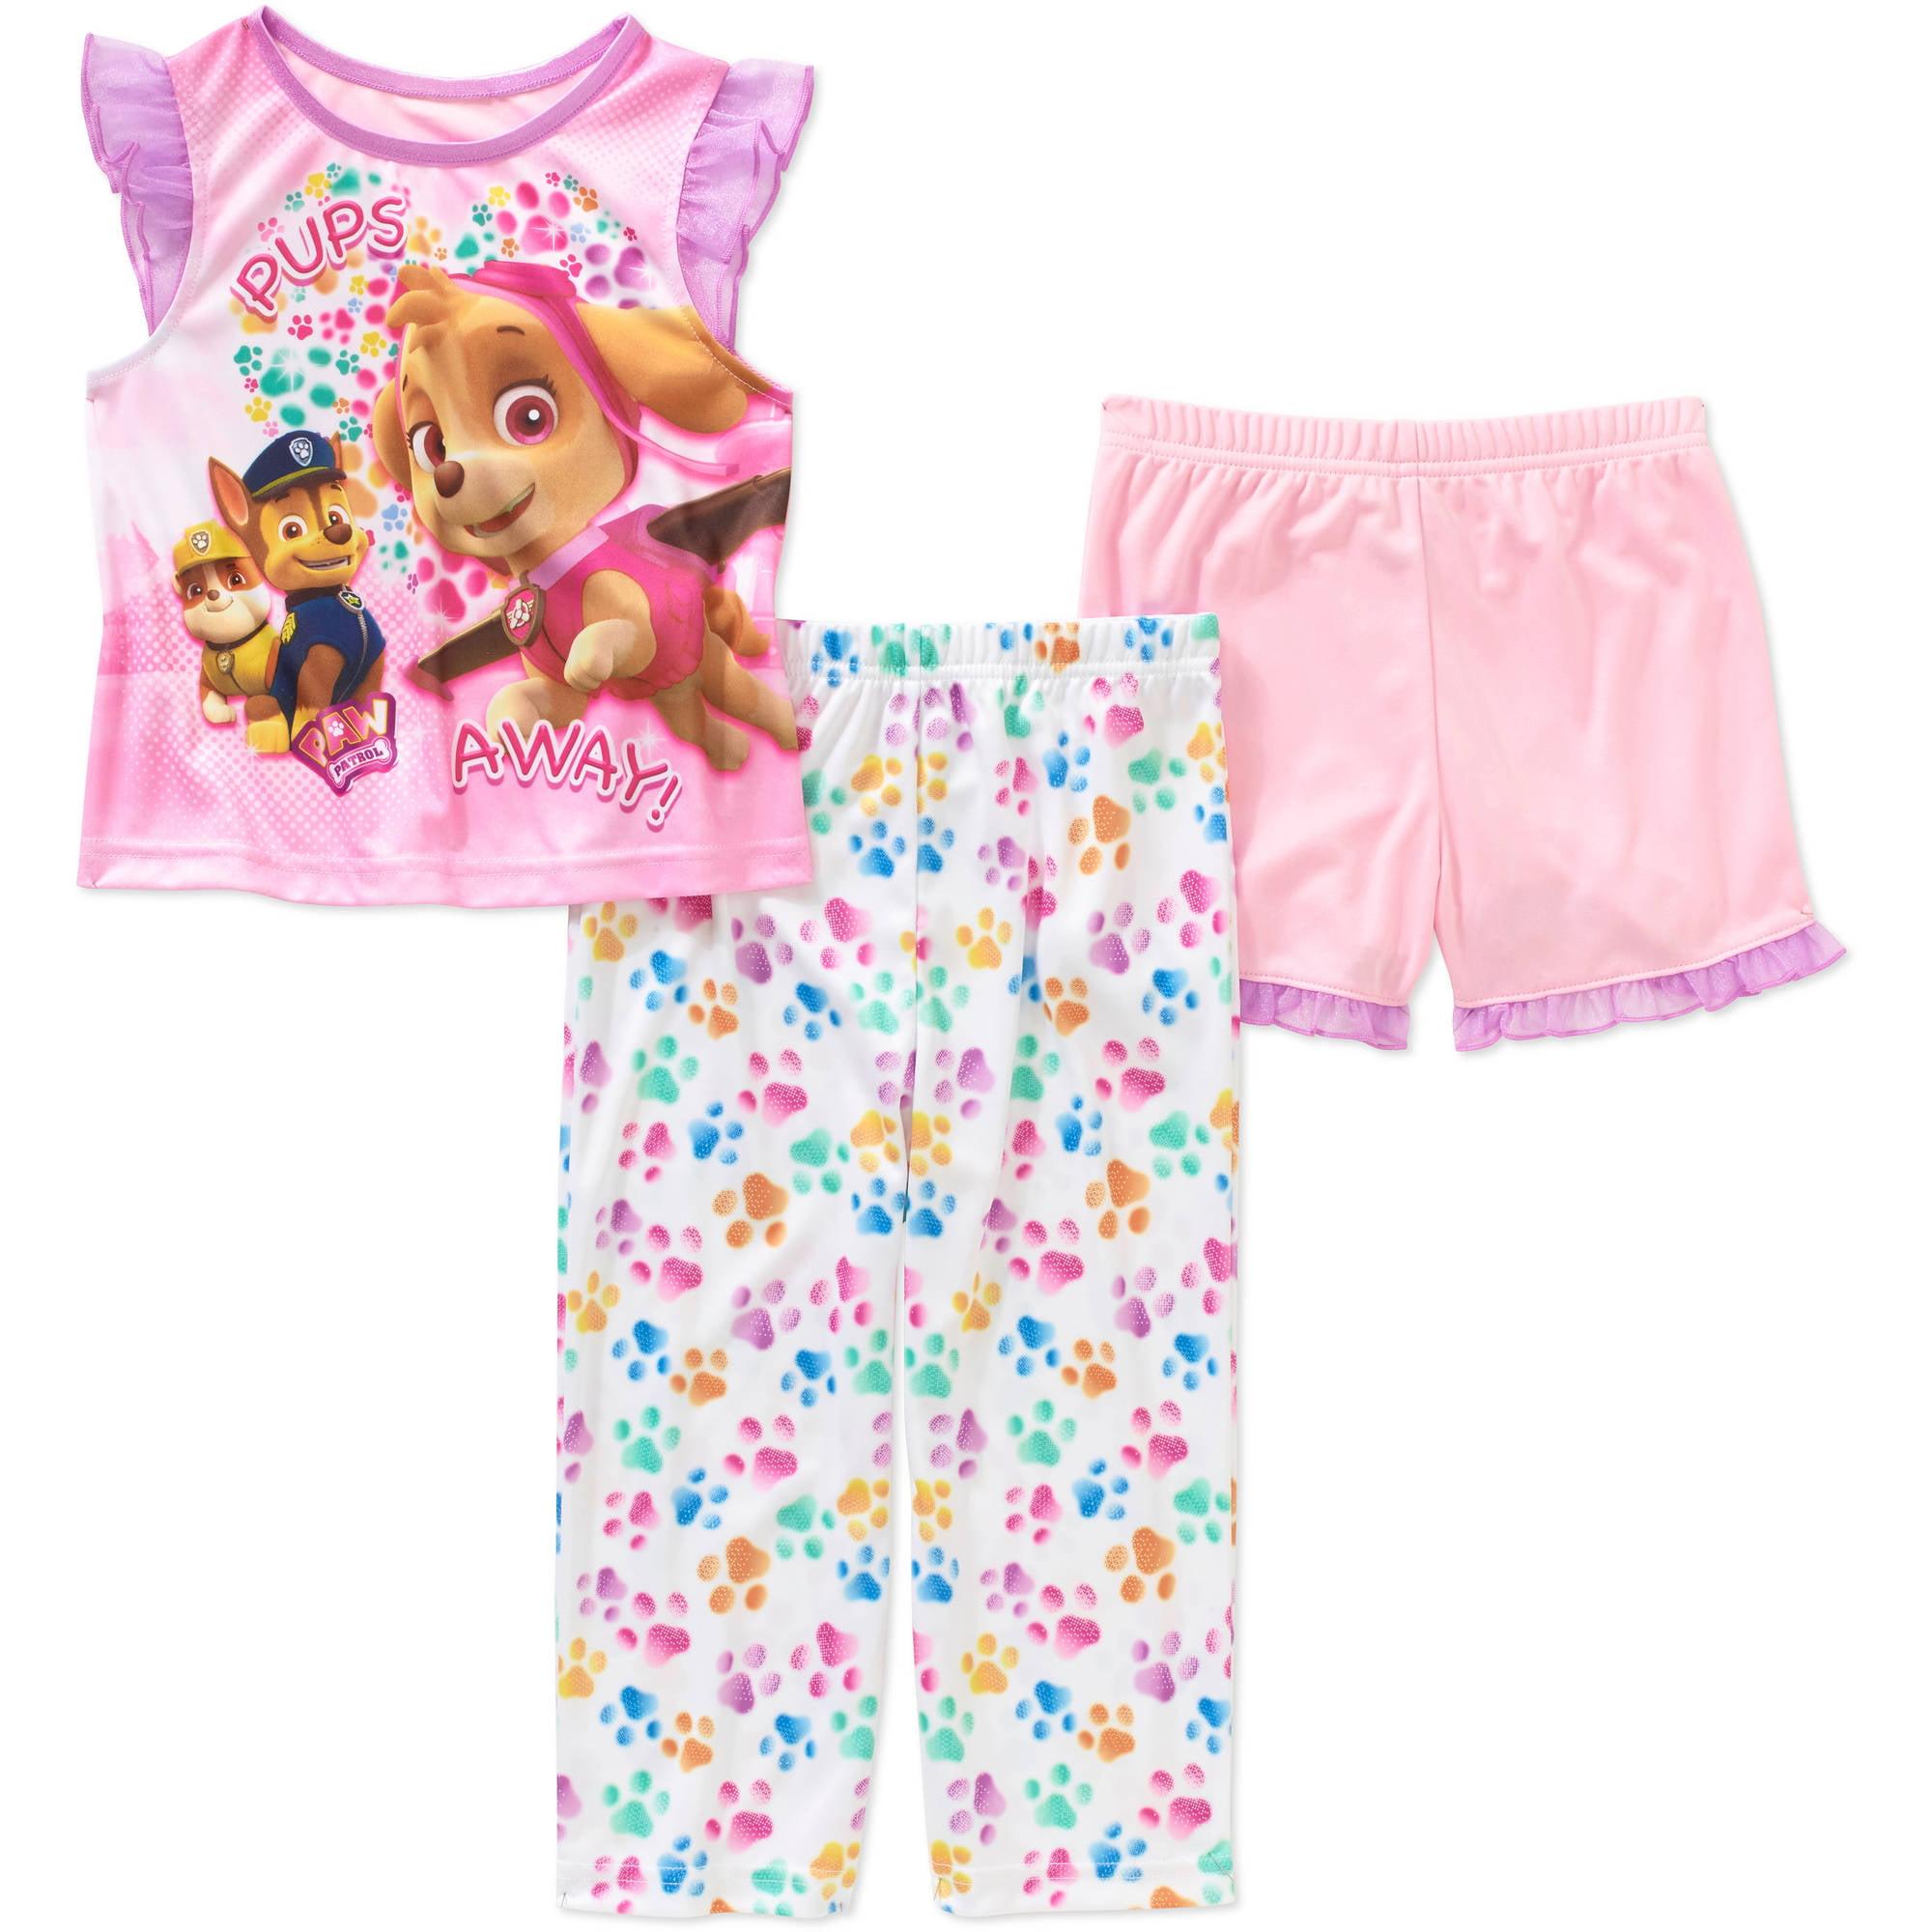 Paw Patrol Baby Toddler Girl Shor Sleeve 3-Piece Sleepwear Set